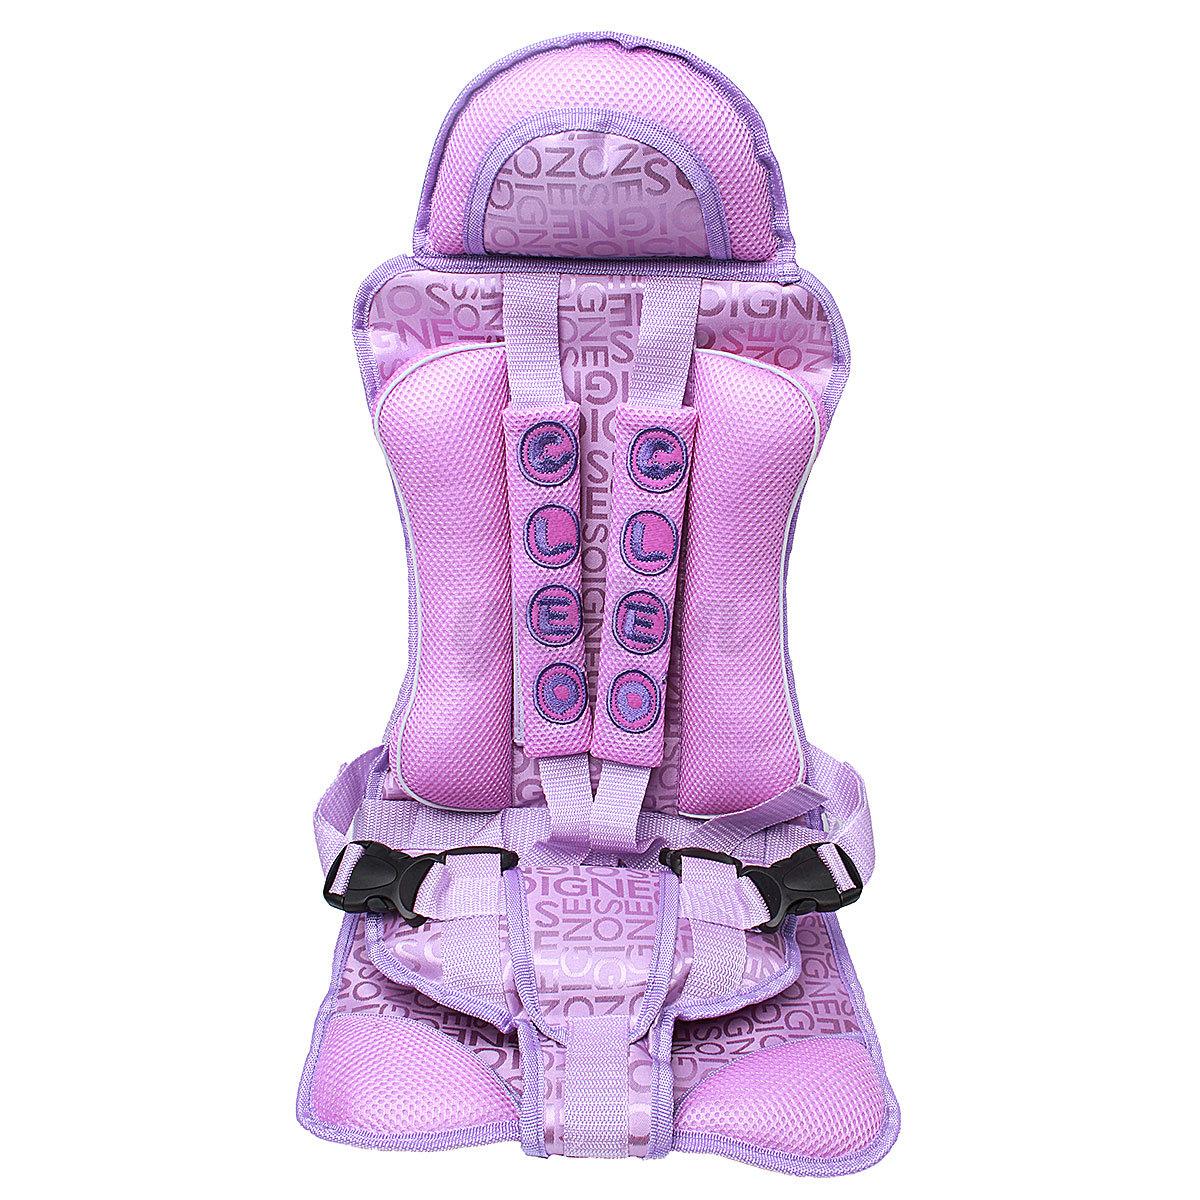 soft safety infant child baby kids car seat cushion toddler carrier booster pad ebay. Black Bedroom Furniture Sets. Home Design Ideas